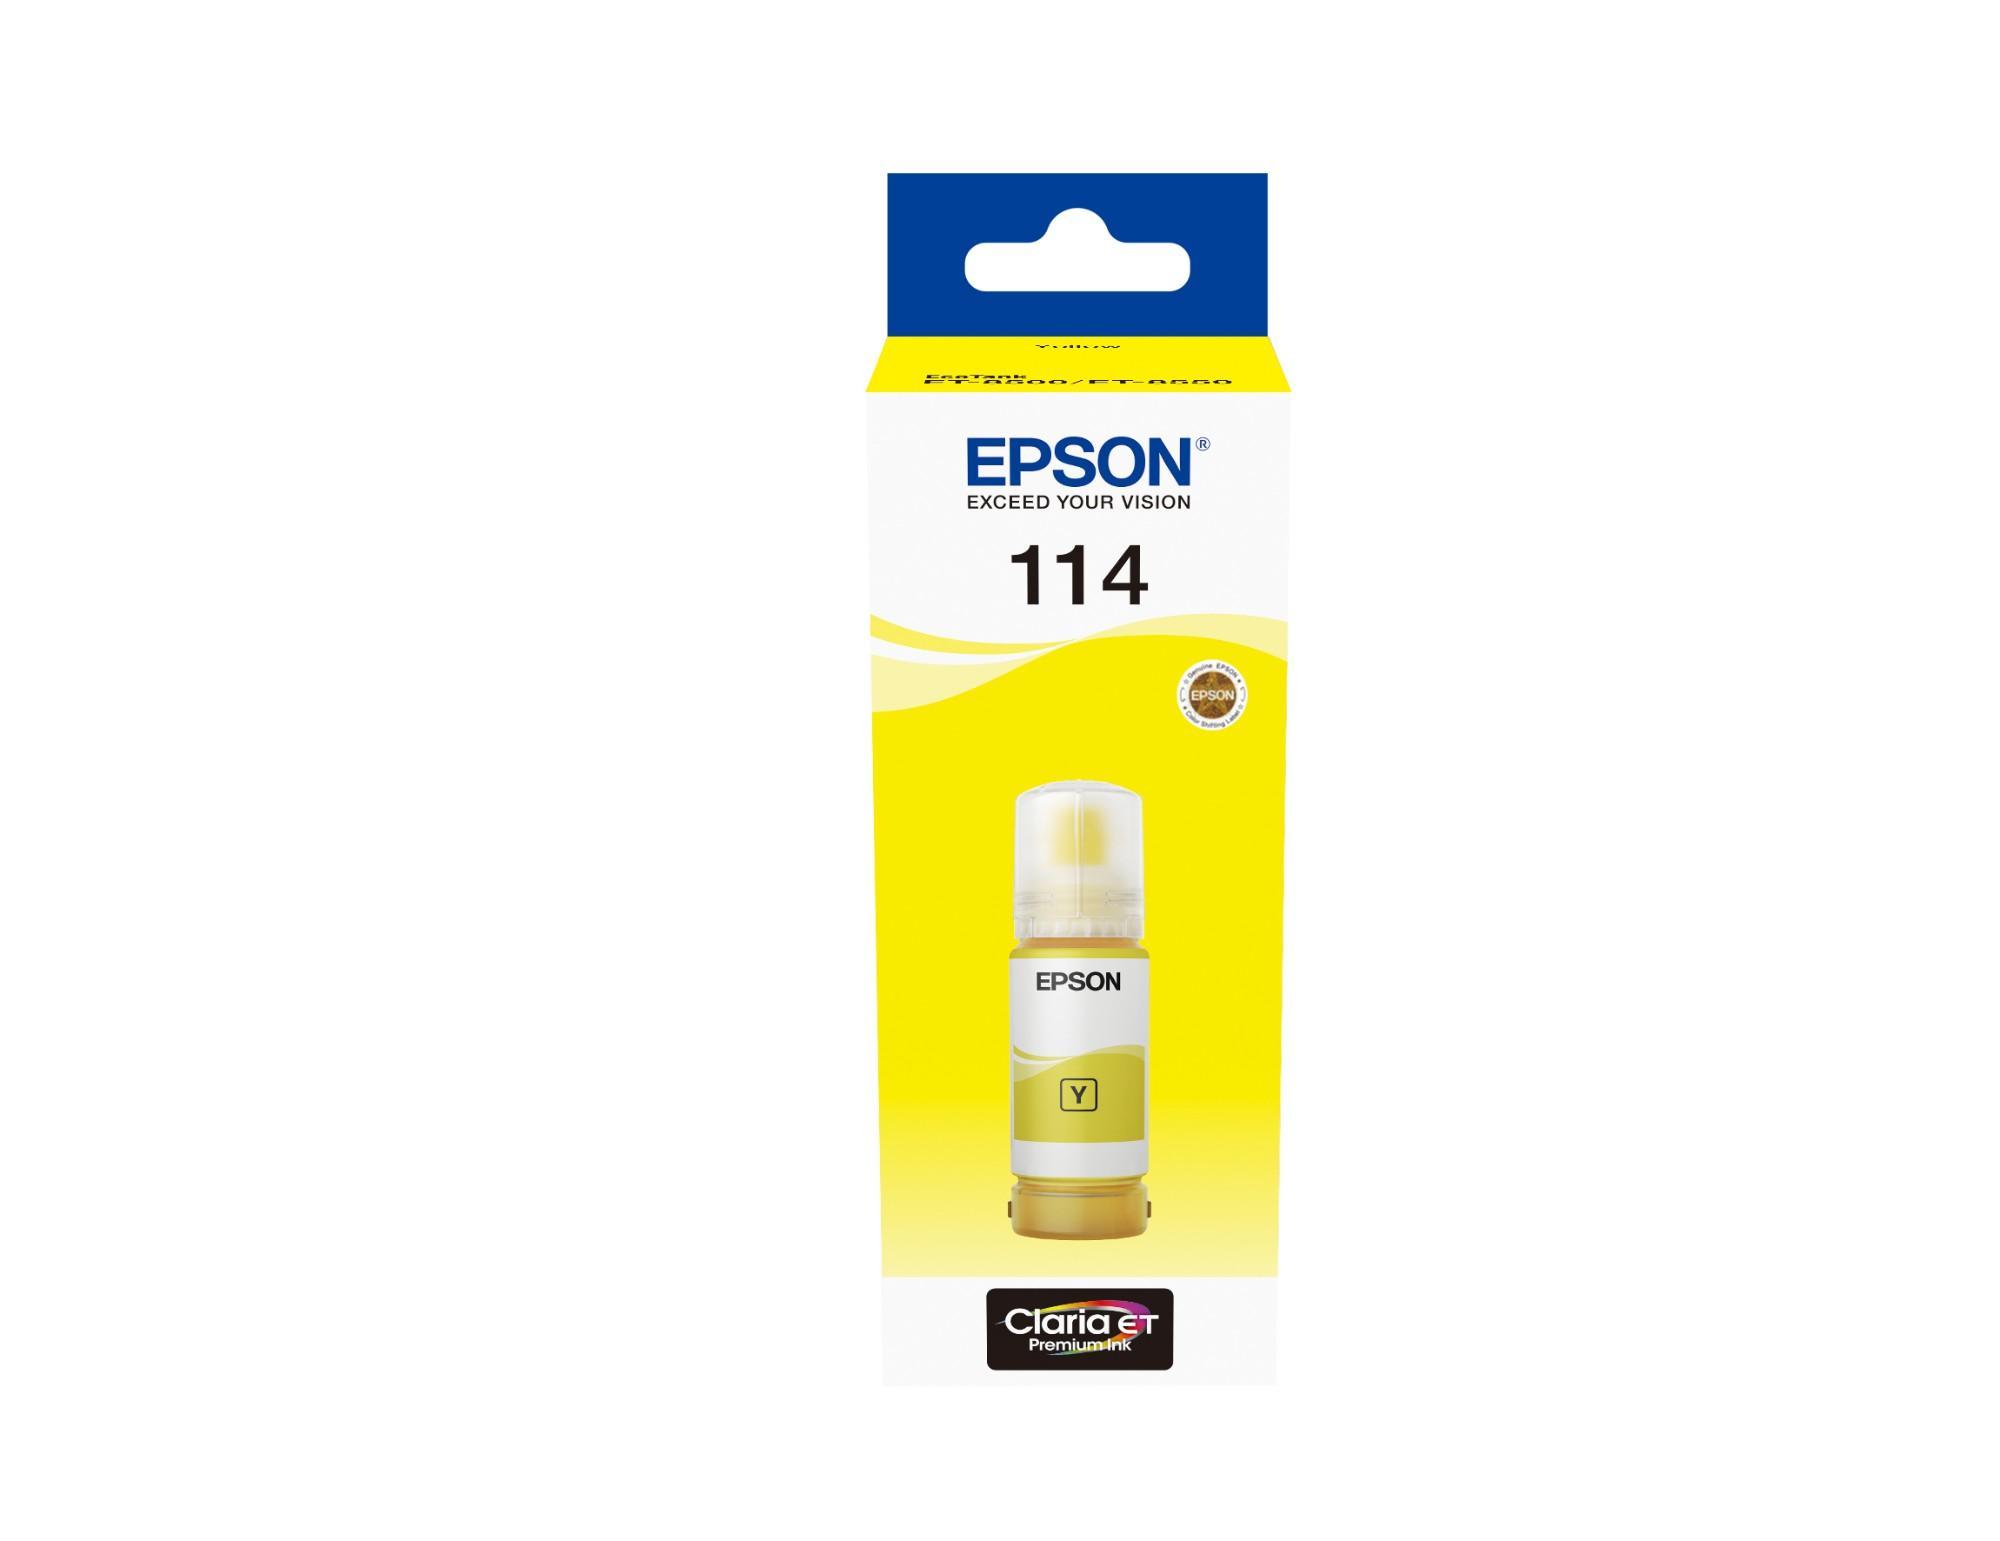 Epson C13T07B440 (114) Ink cartridge yellow, 70ml